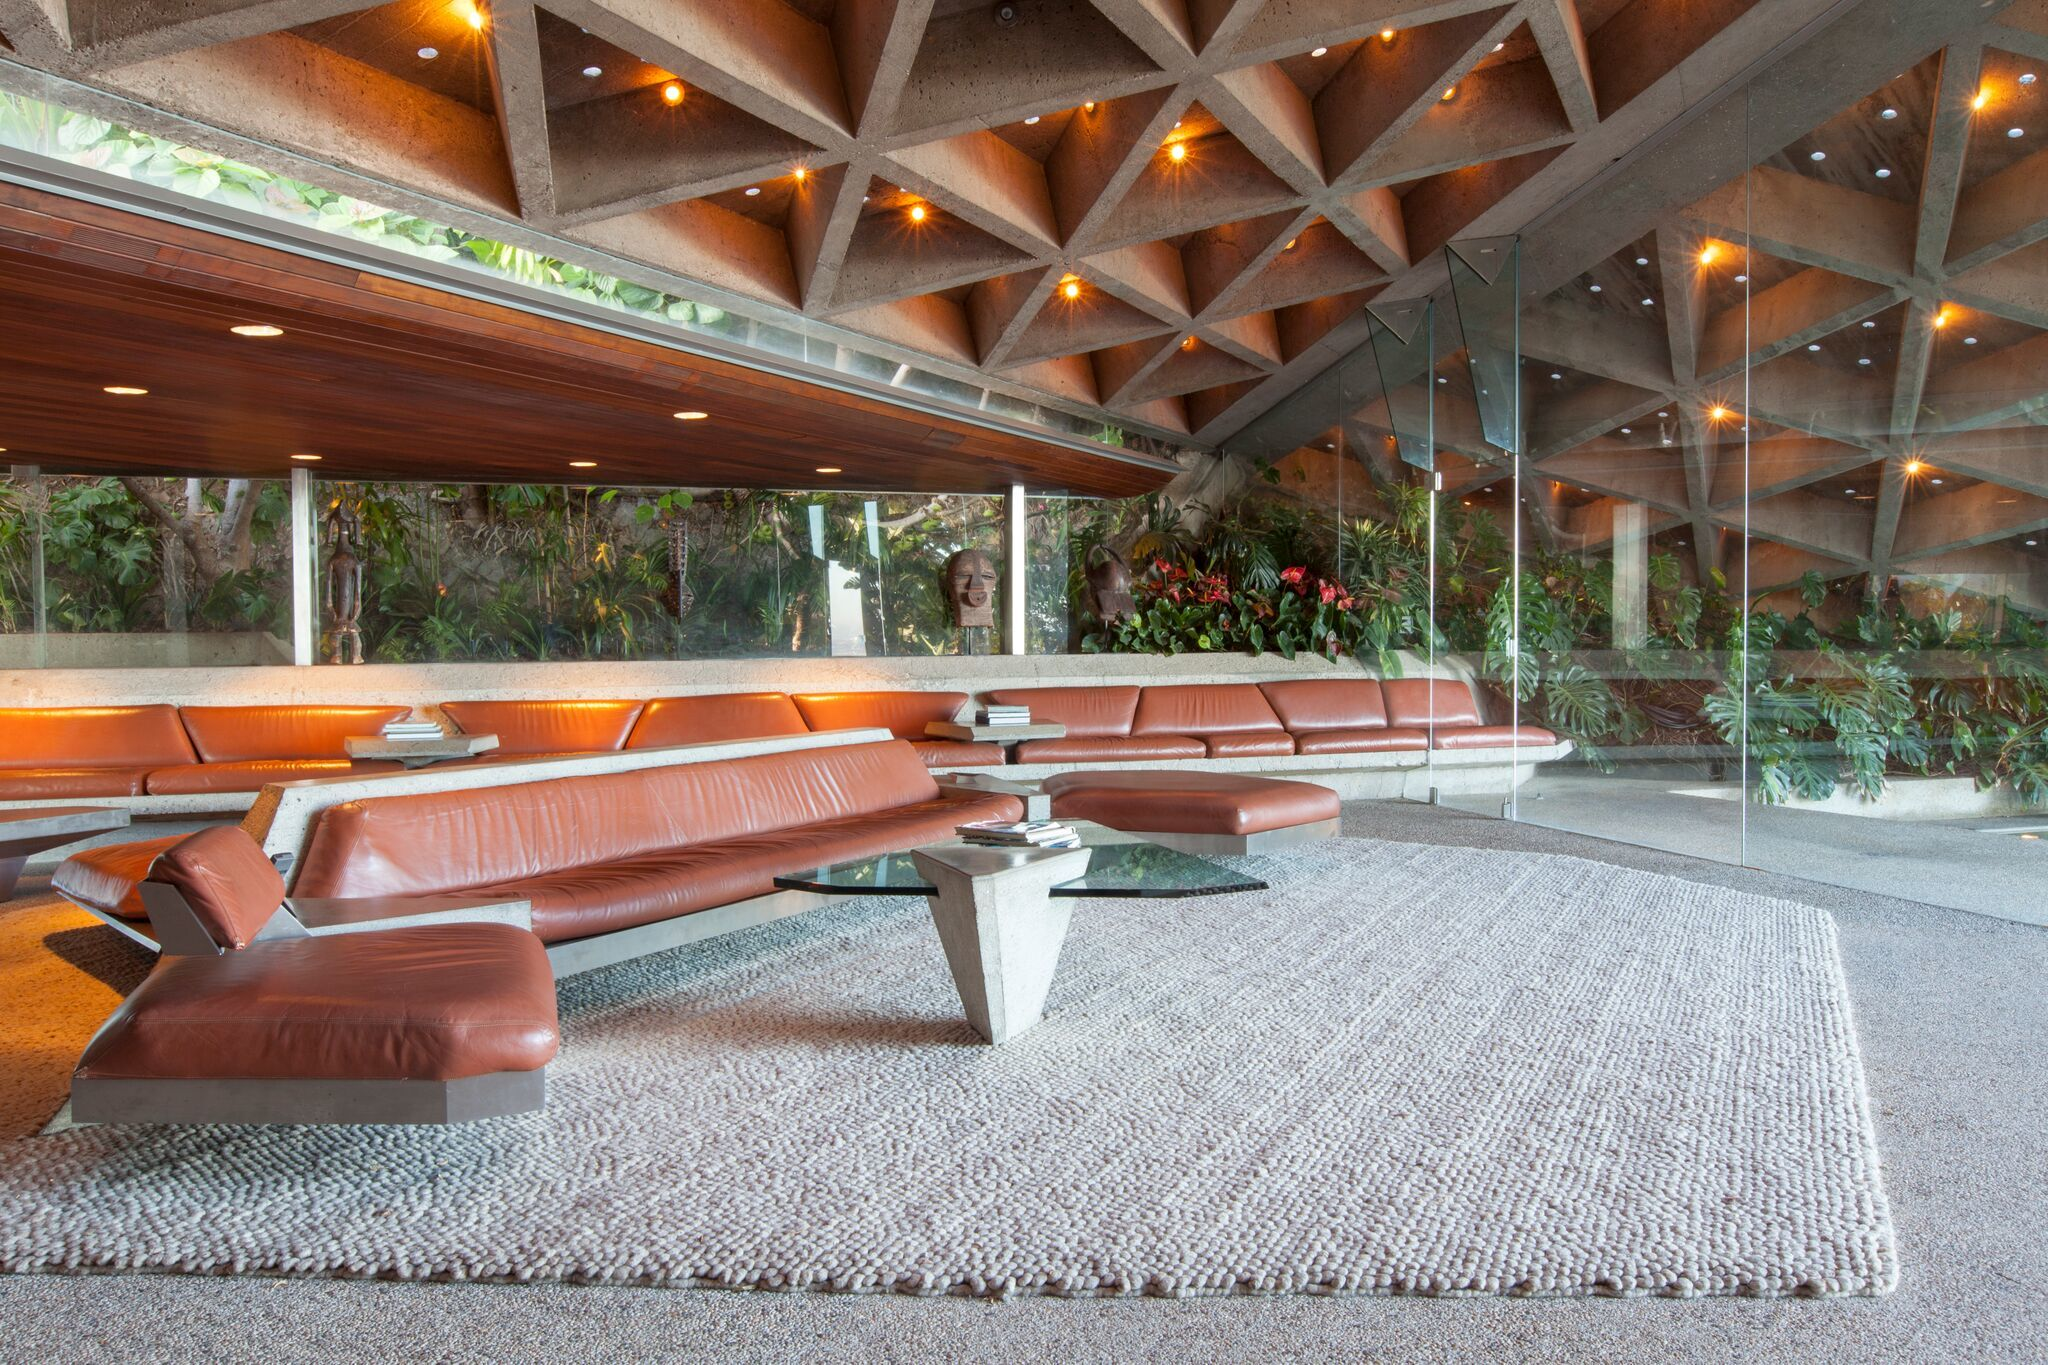 A living room made of concrete (seriously)